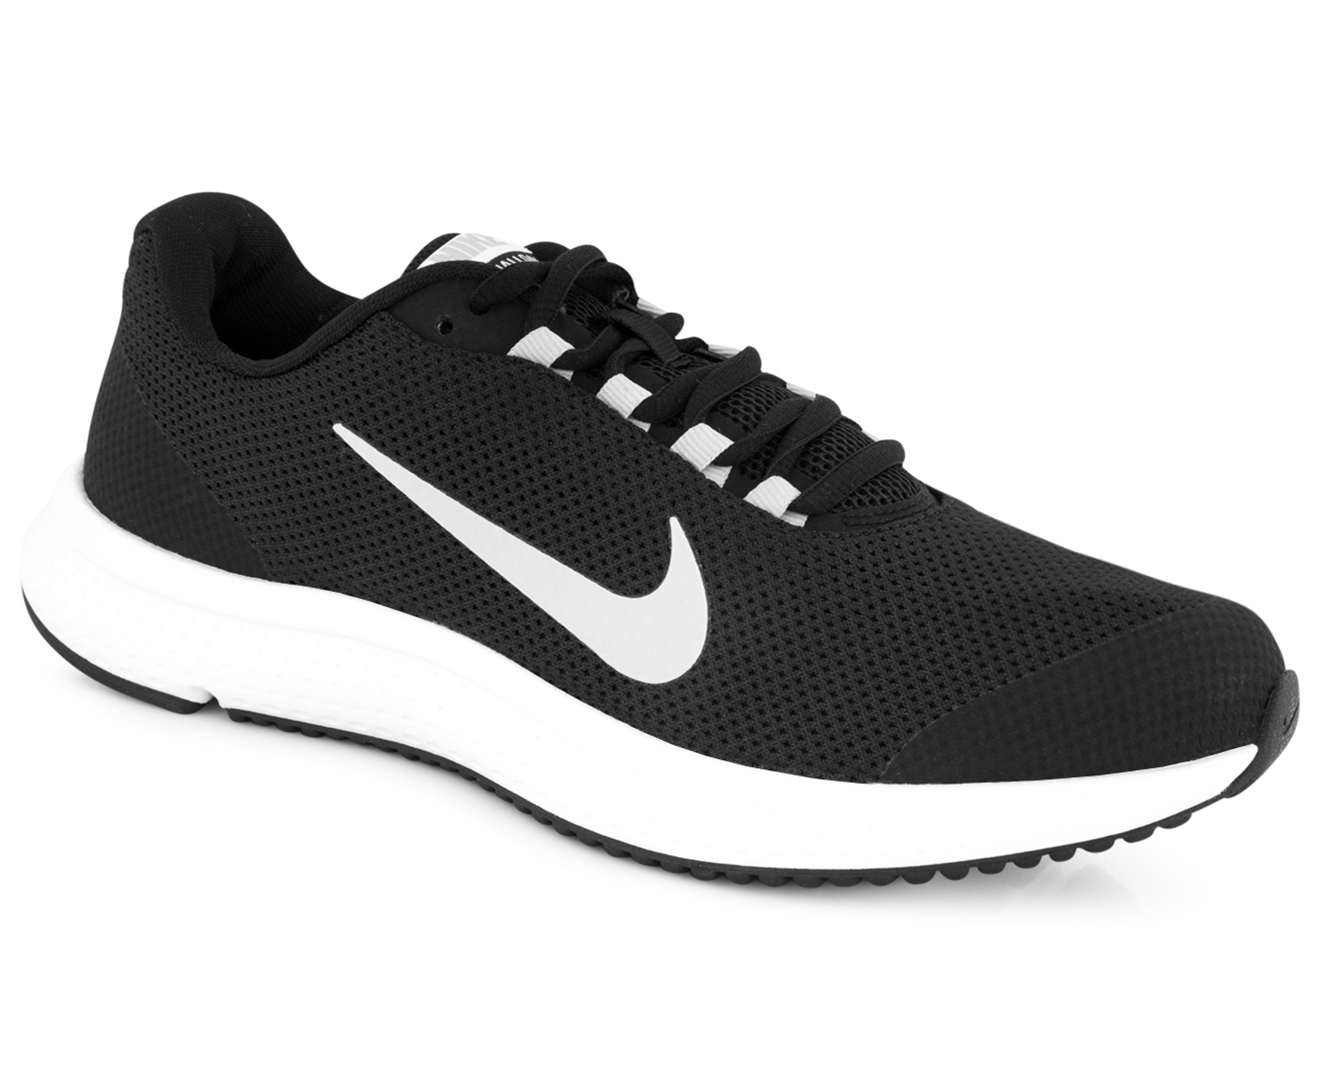 Nike Women's Runallday Shoe - Black/White/Grey | Great daily deals at  Australia's favourite superstore | Catch.com.au